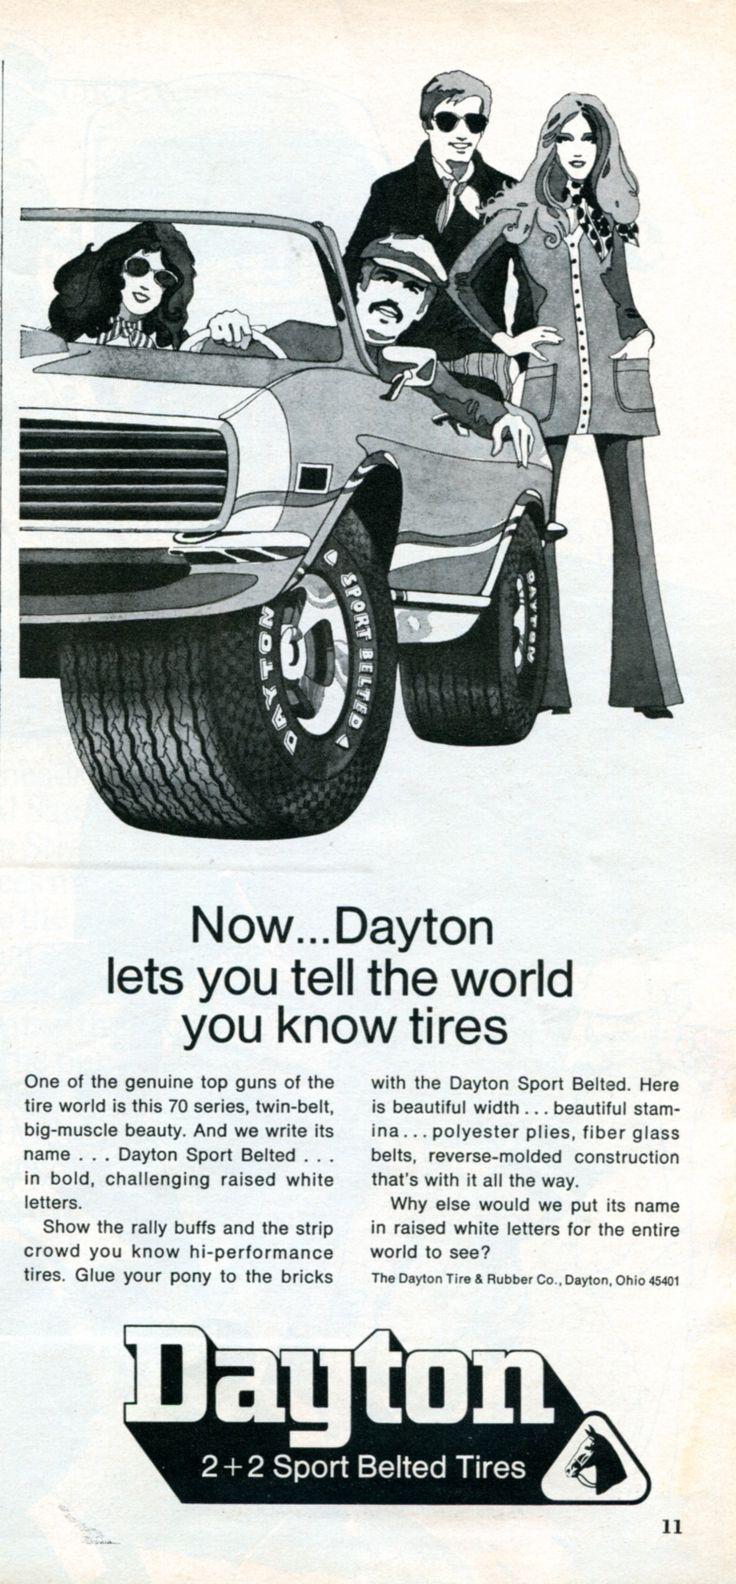 Honda Dealers Dayton Ohio >> 23 best B.F. Goodrich Tires Vintage Ads images on Pinterest | Marketing, Squares and Vintage ads